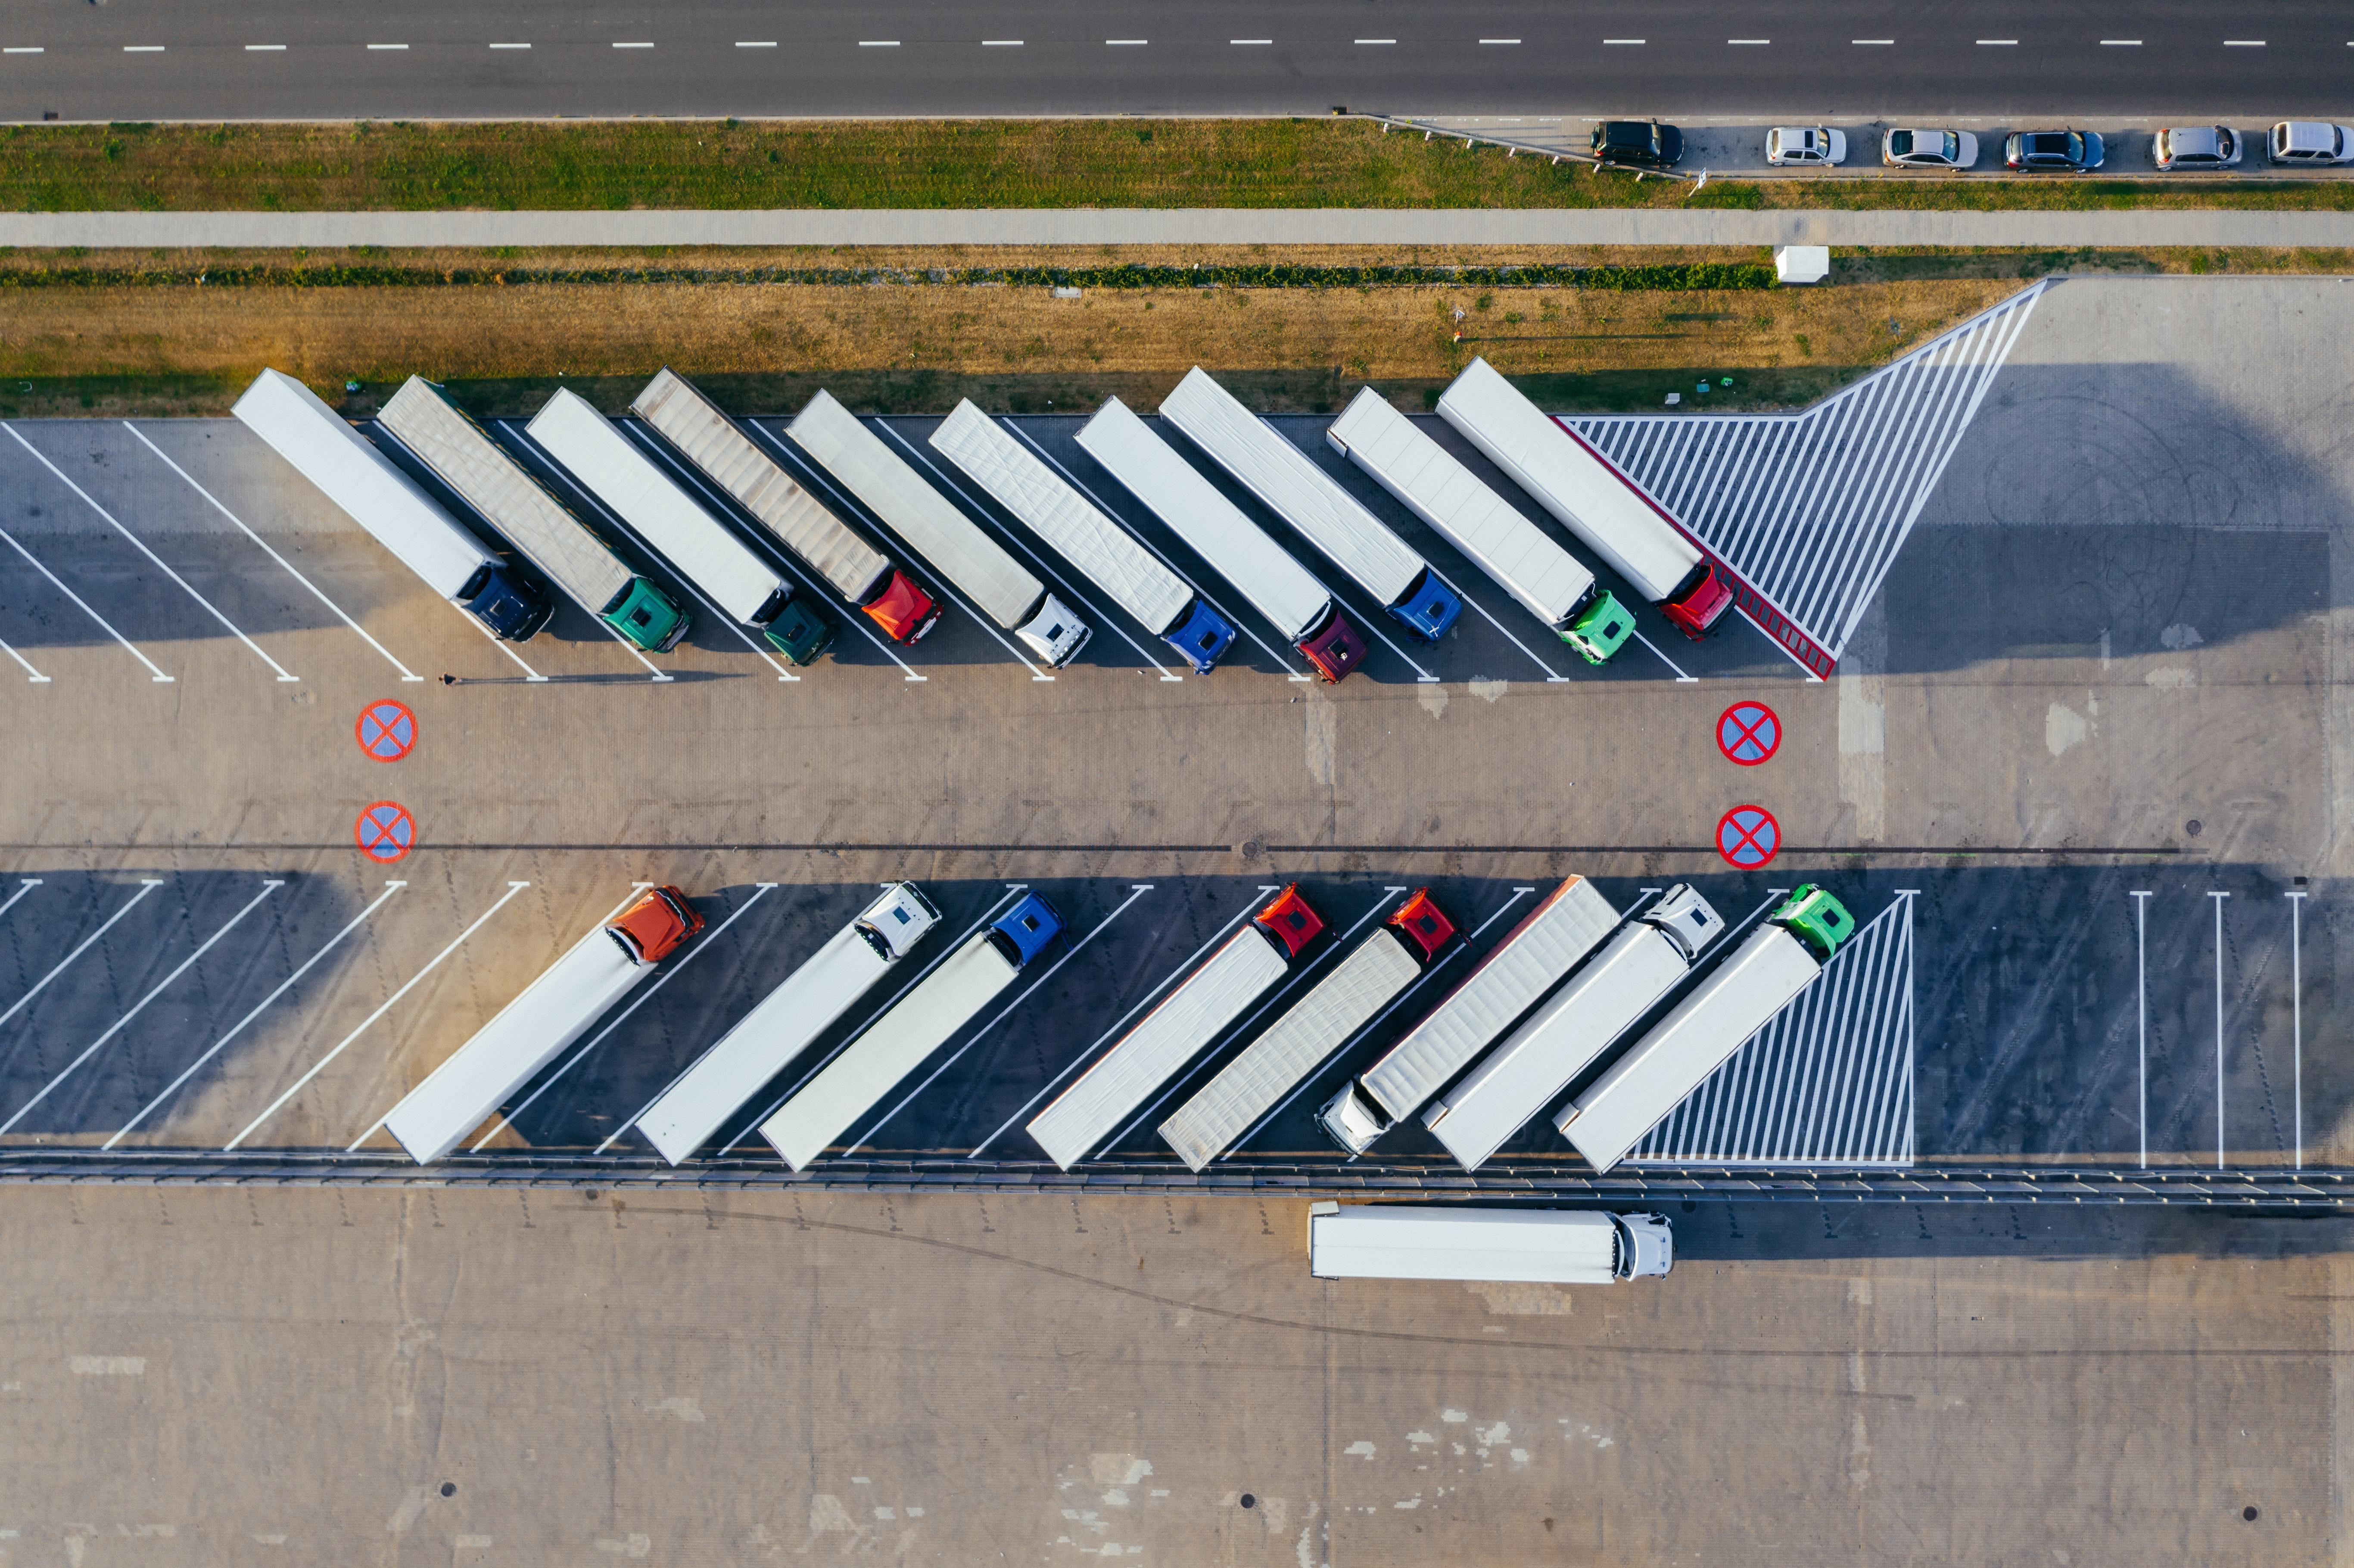 trucks_lawyer_transport law